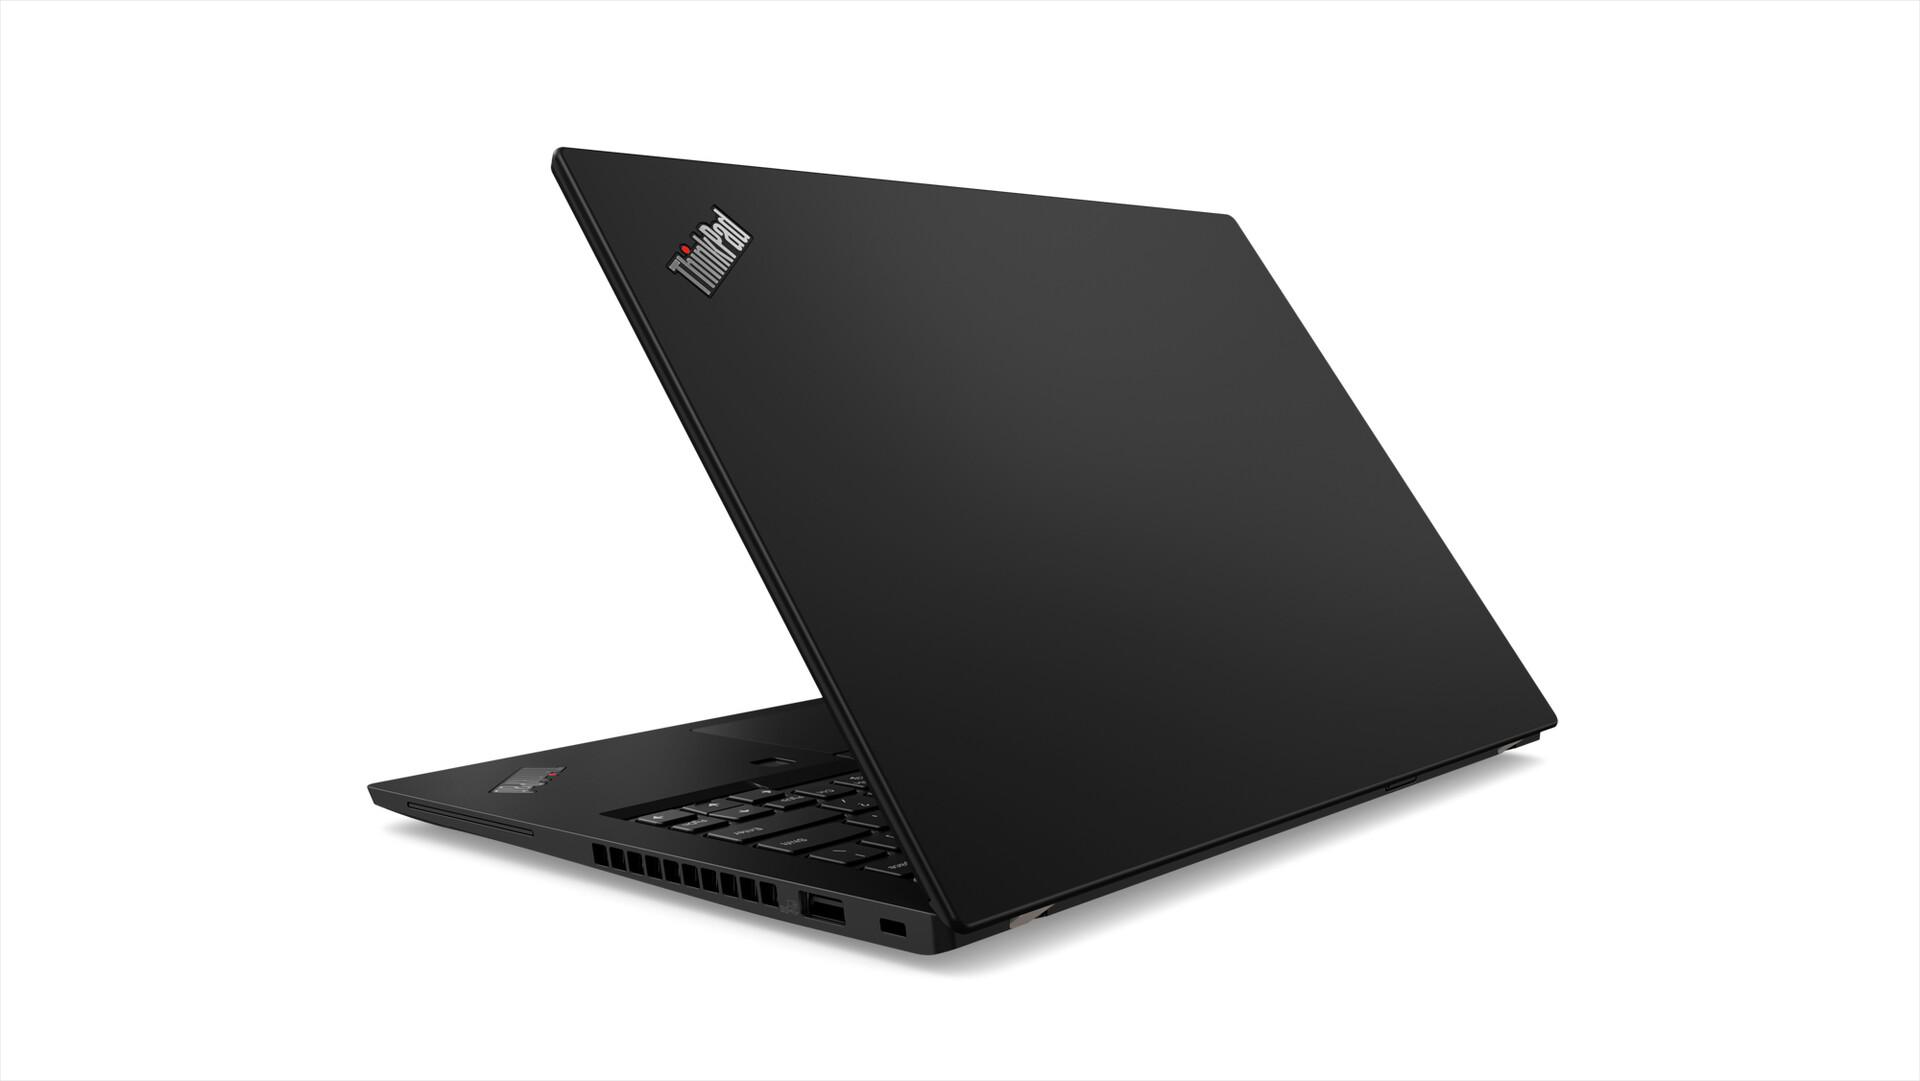 csm ThinkPad X390 7 901d585e3c